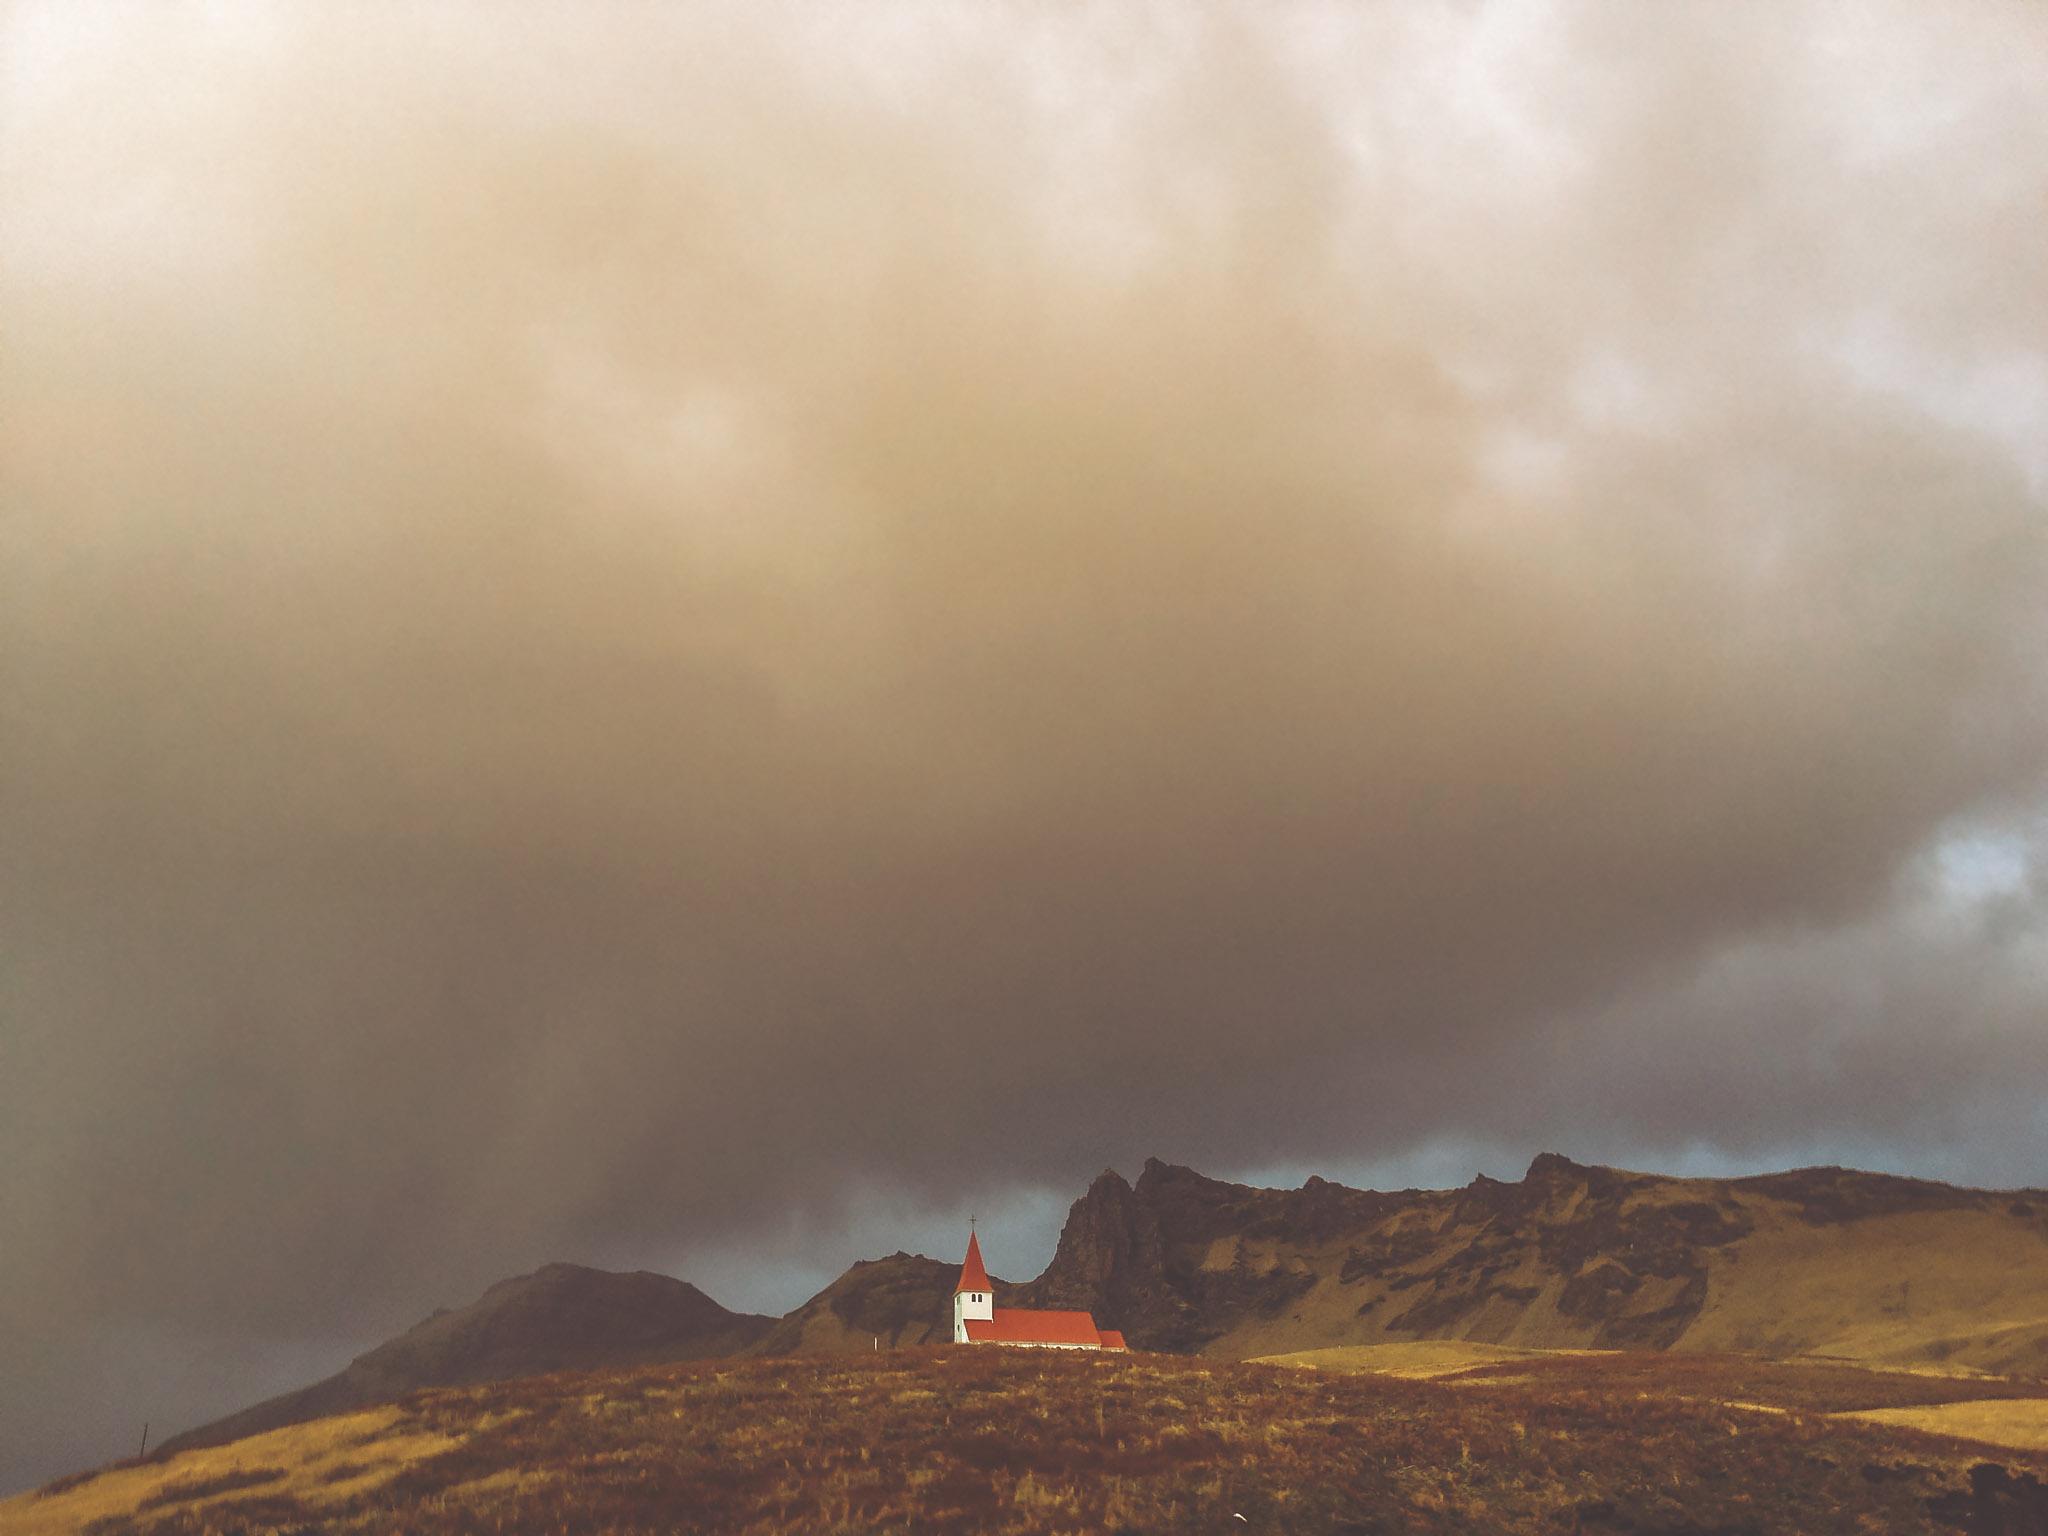 ICELAND-IPHONE-WEB-067.jpg